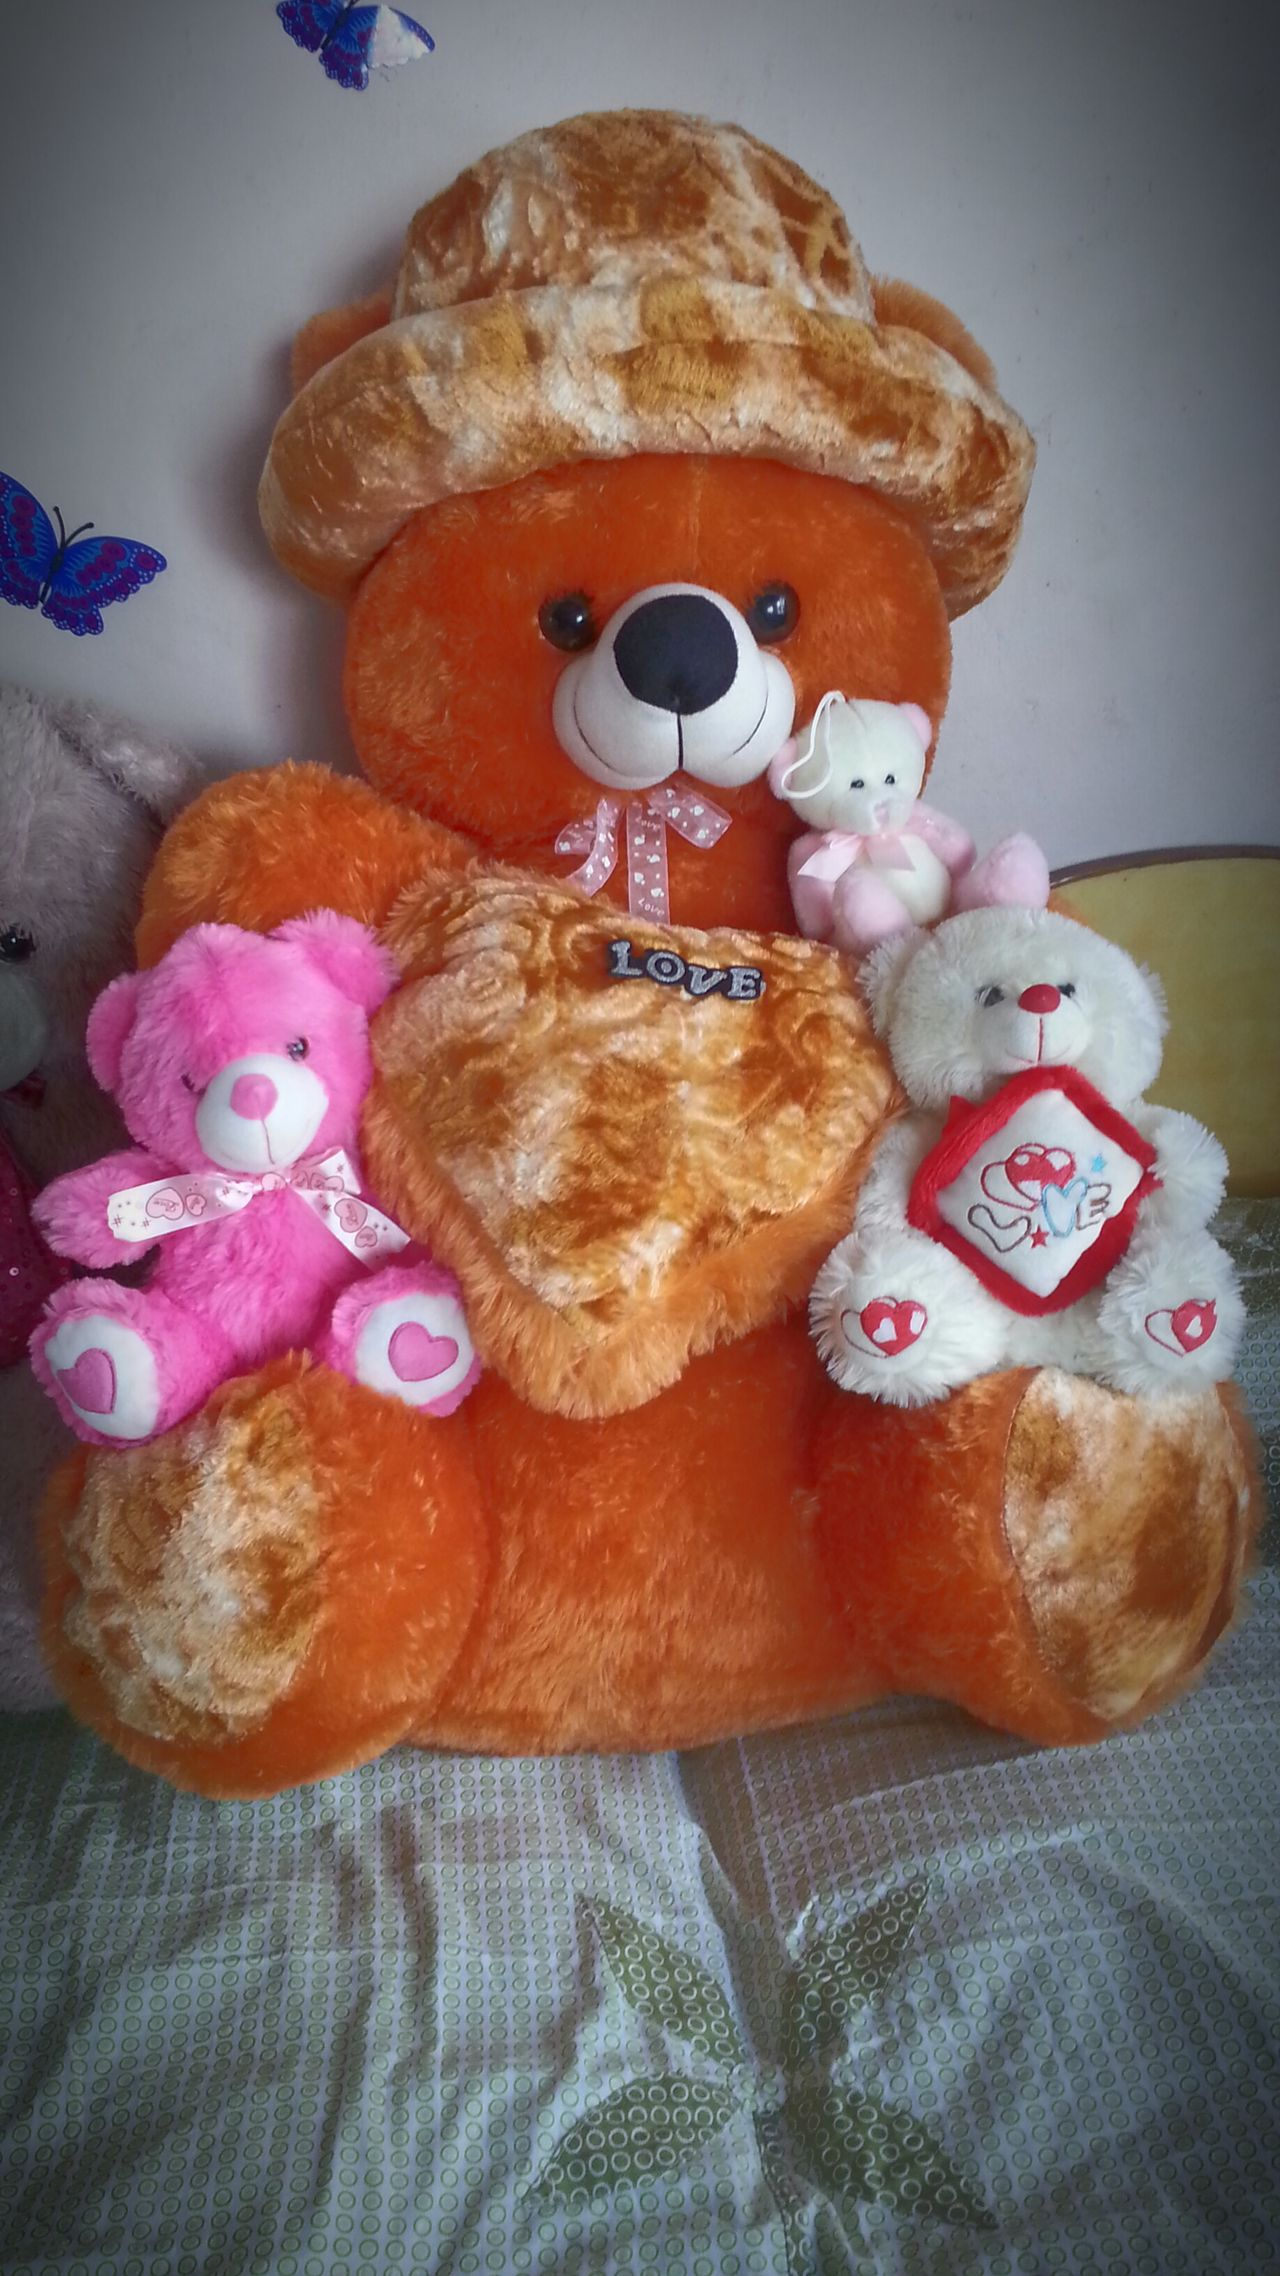 Randomclick Teddybear Teddylove Enjoying Life